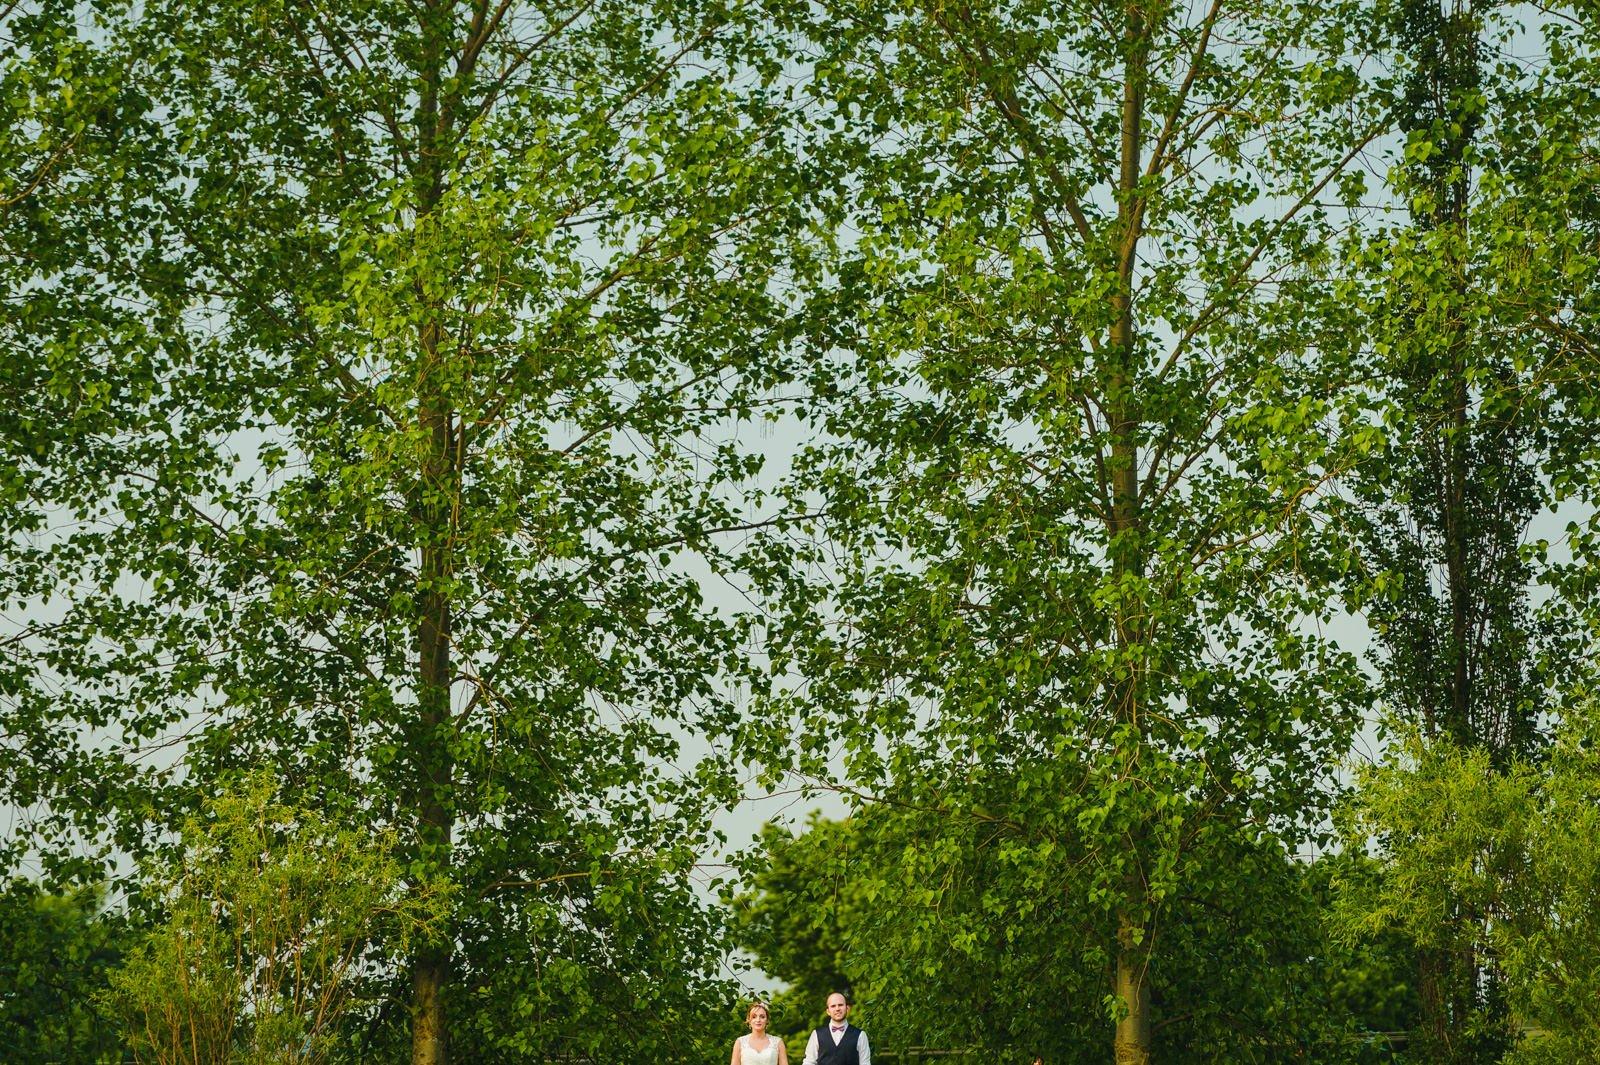 Millers Of Netley wedding, Dorrington, Shrewsbury | Emma + Ben 86